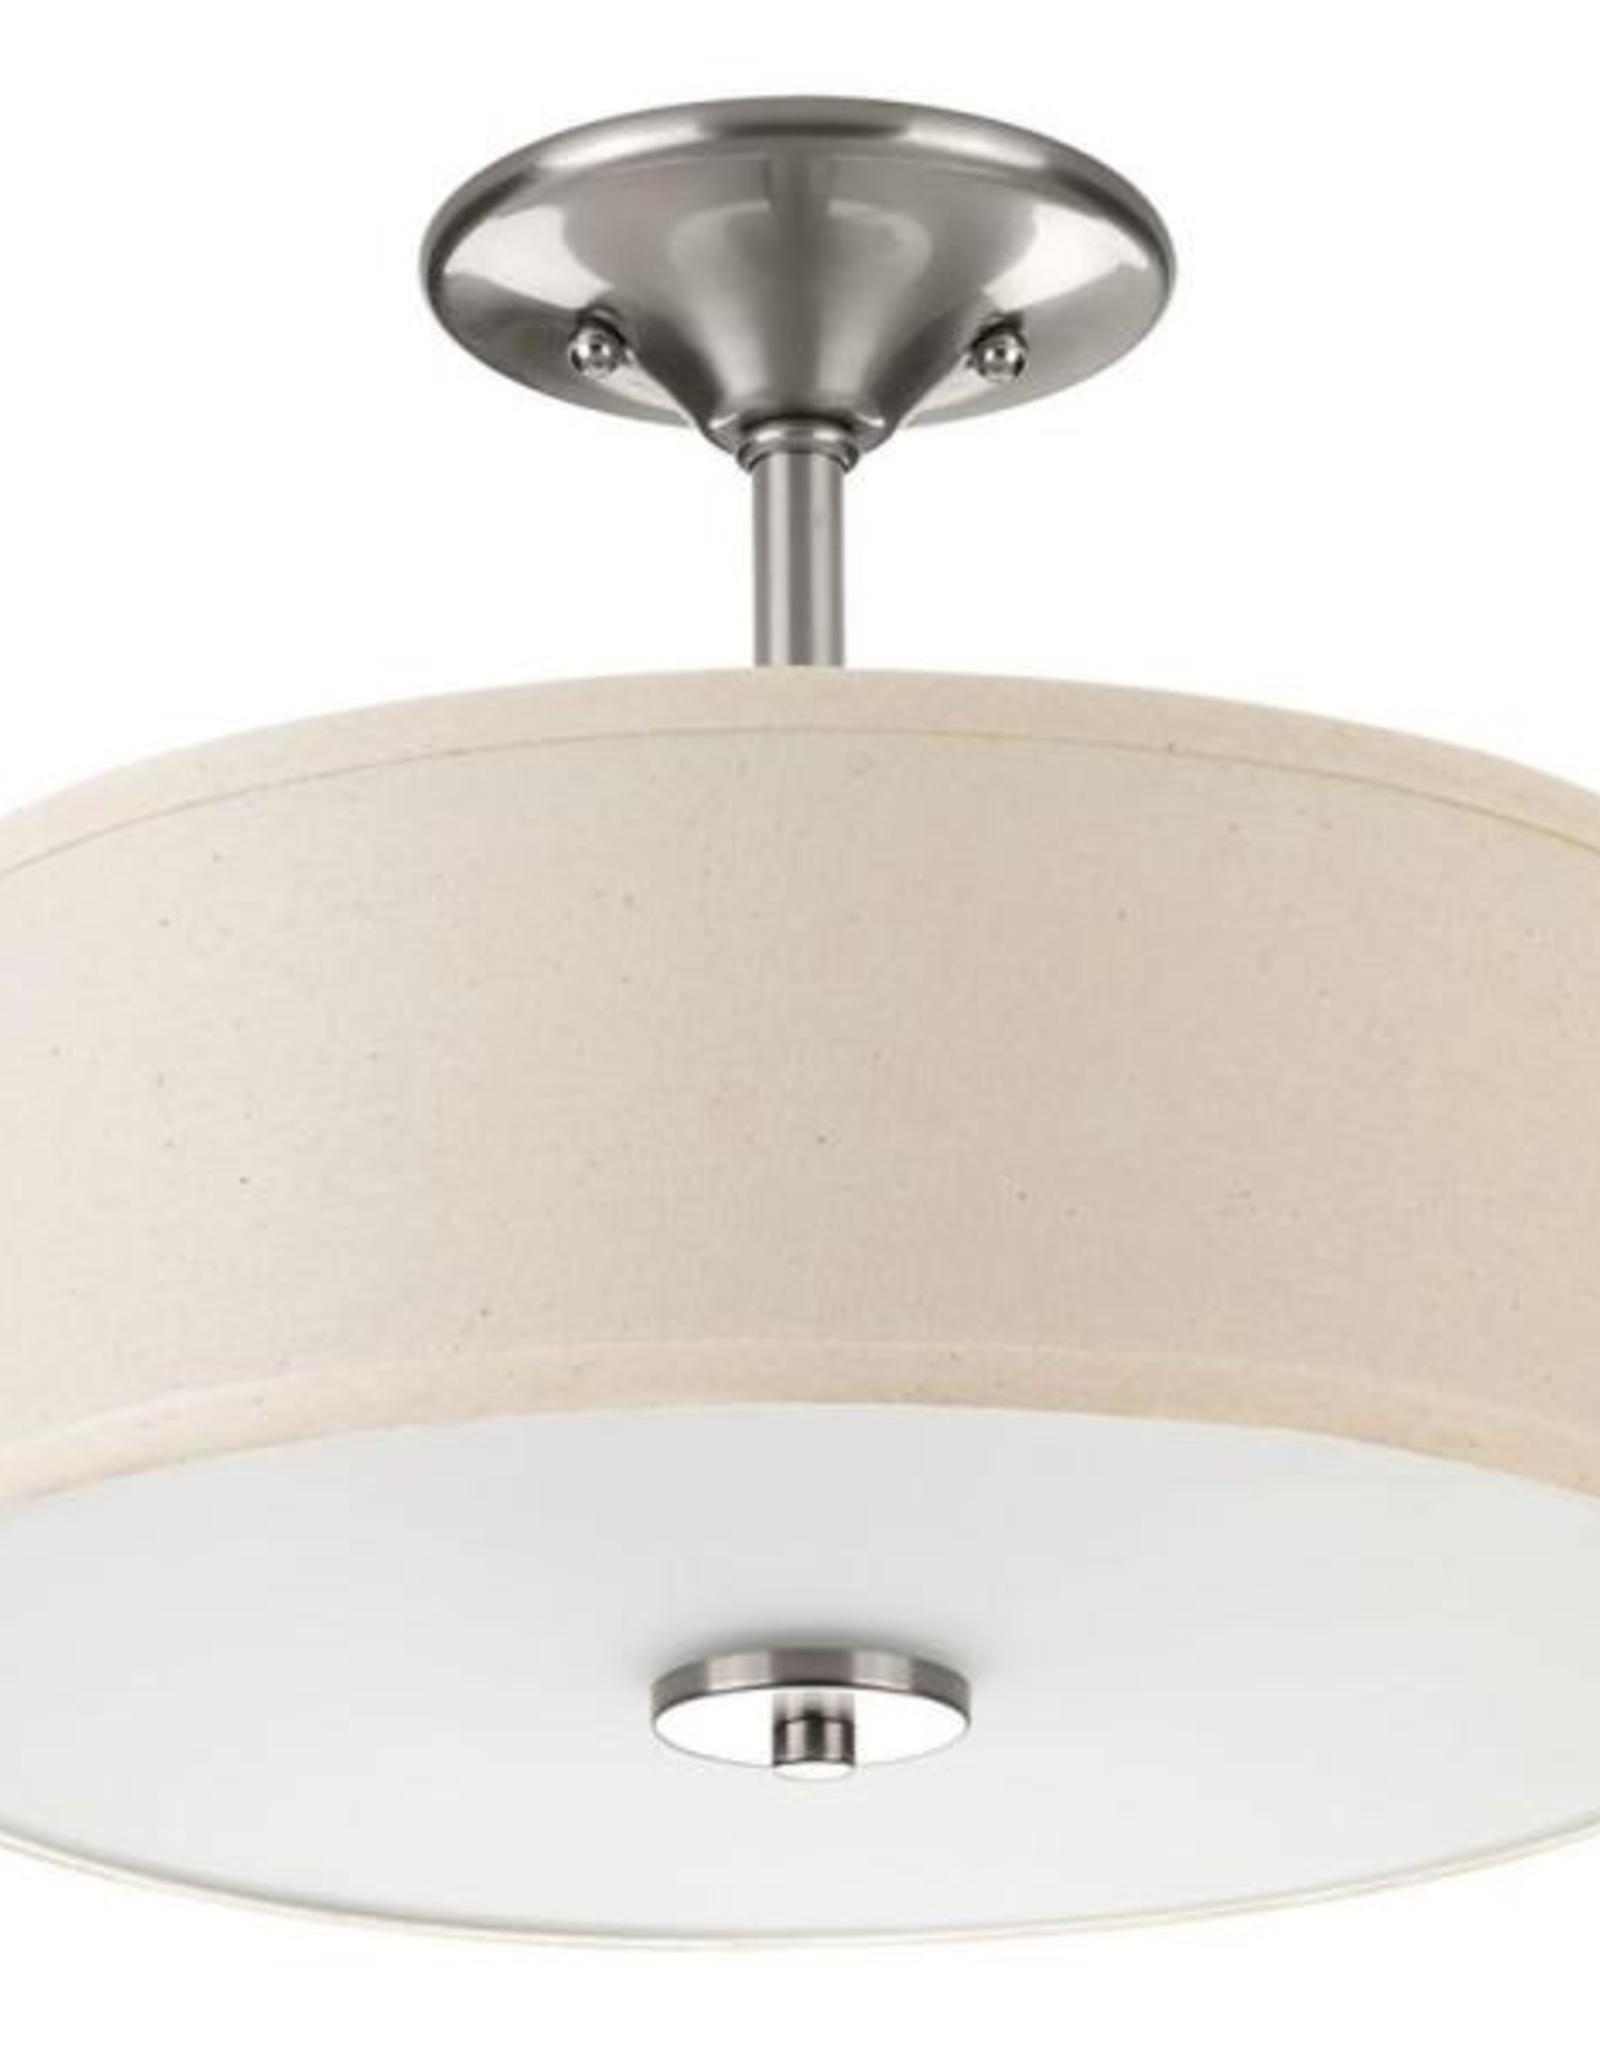 Progress Lighting Inspire Collection 13 in. 2-Light Brushed Nickel Bedroom Semi-Flush Mount